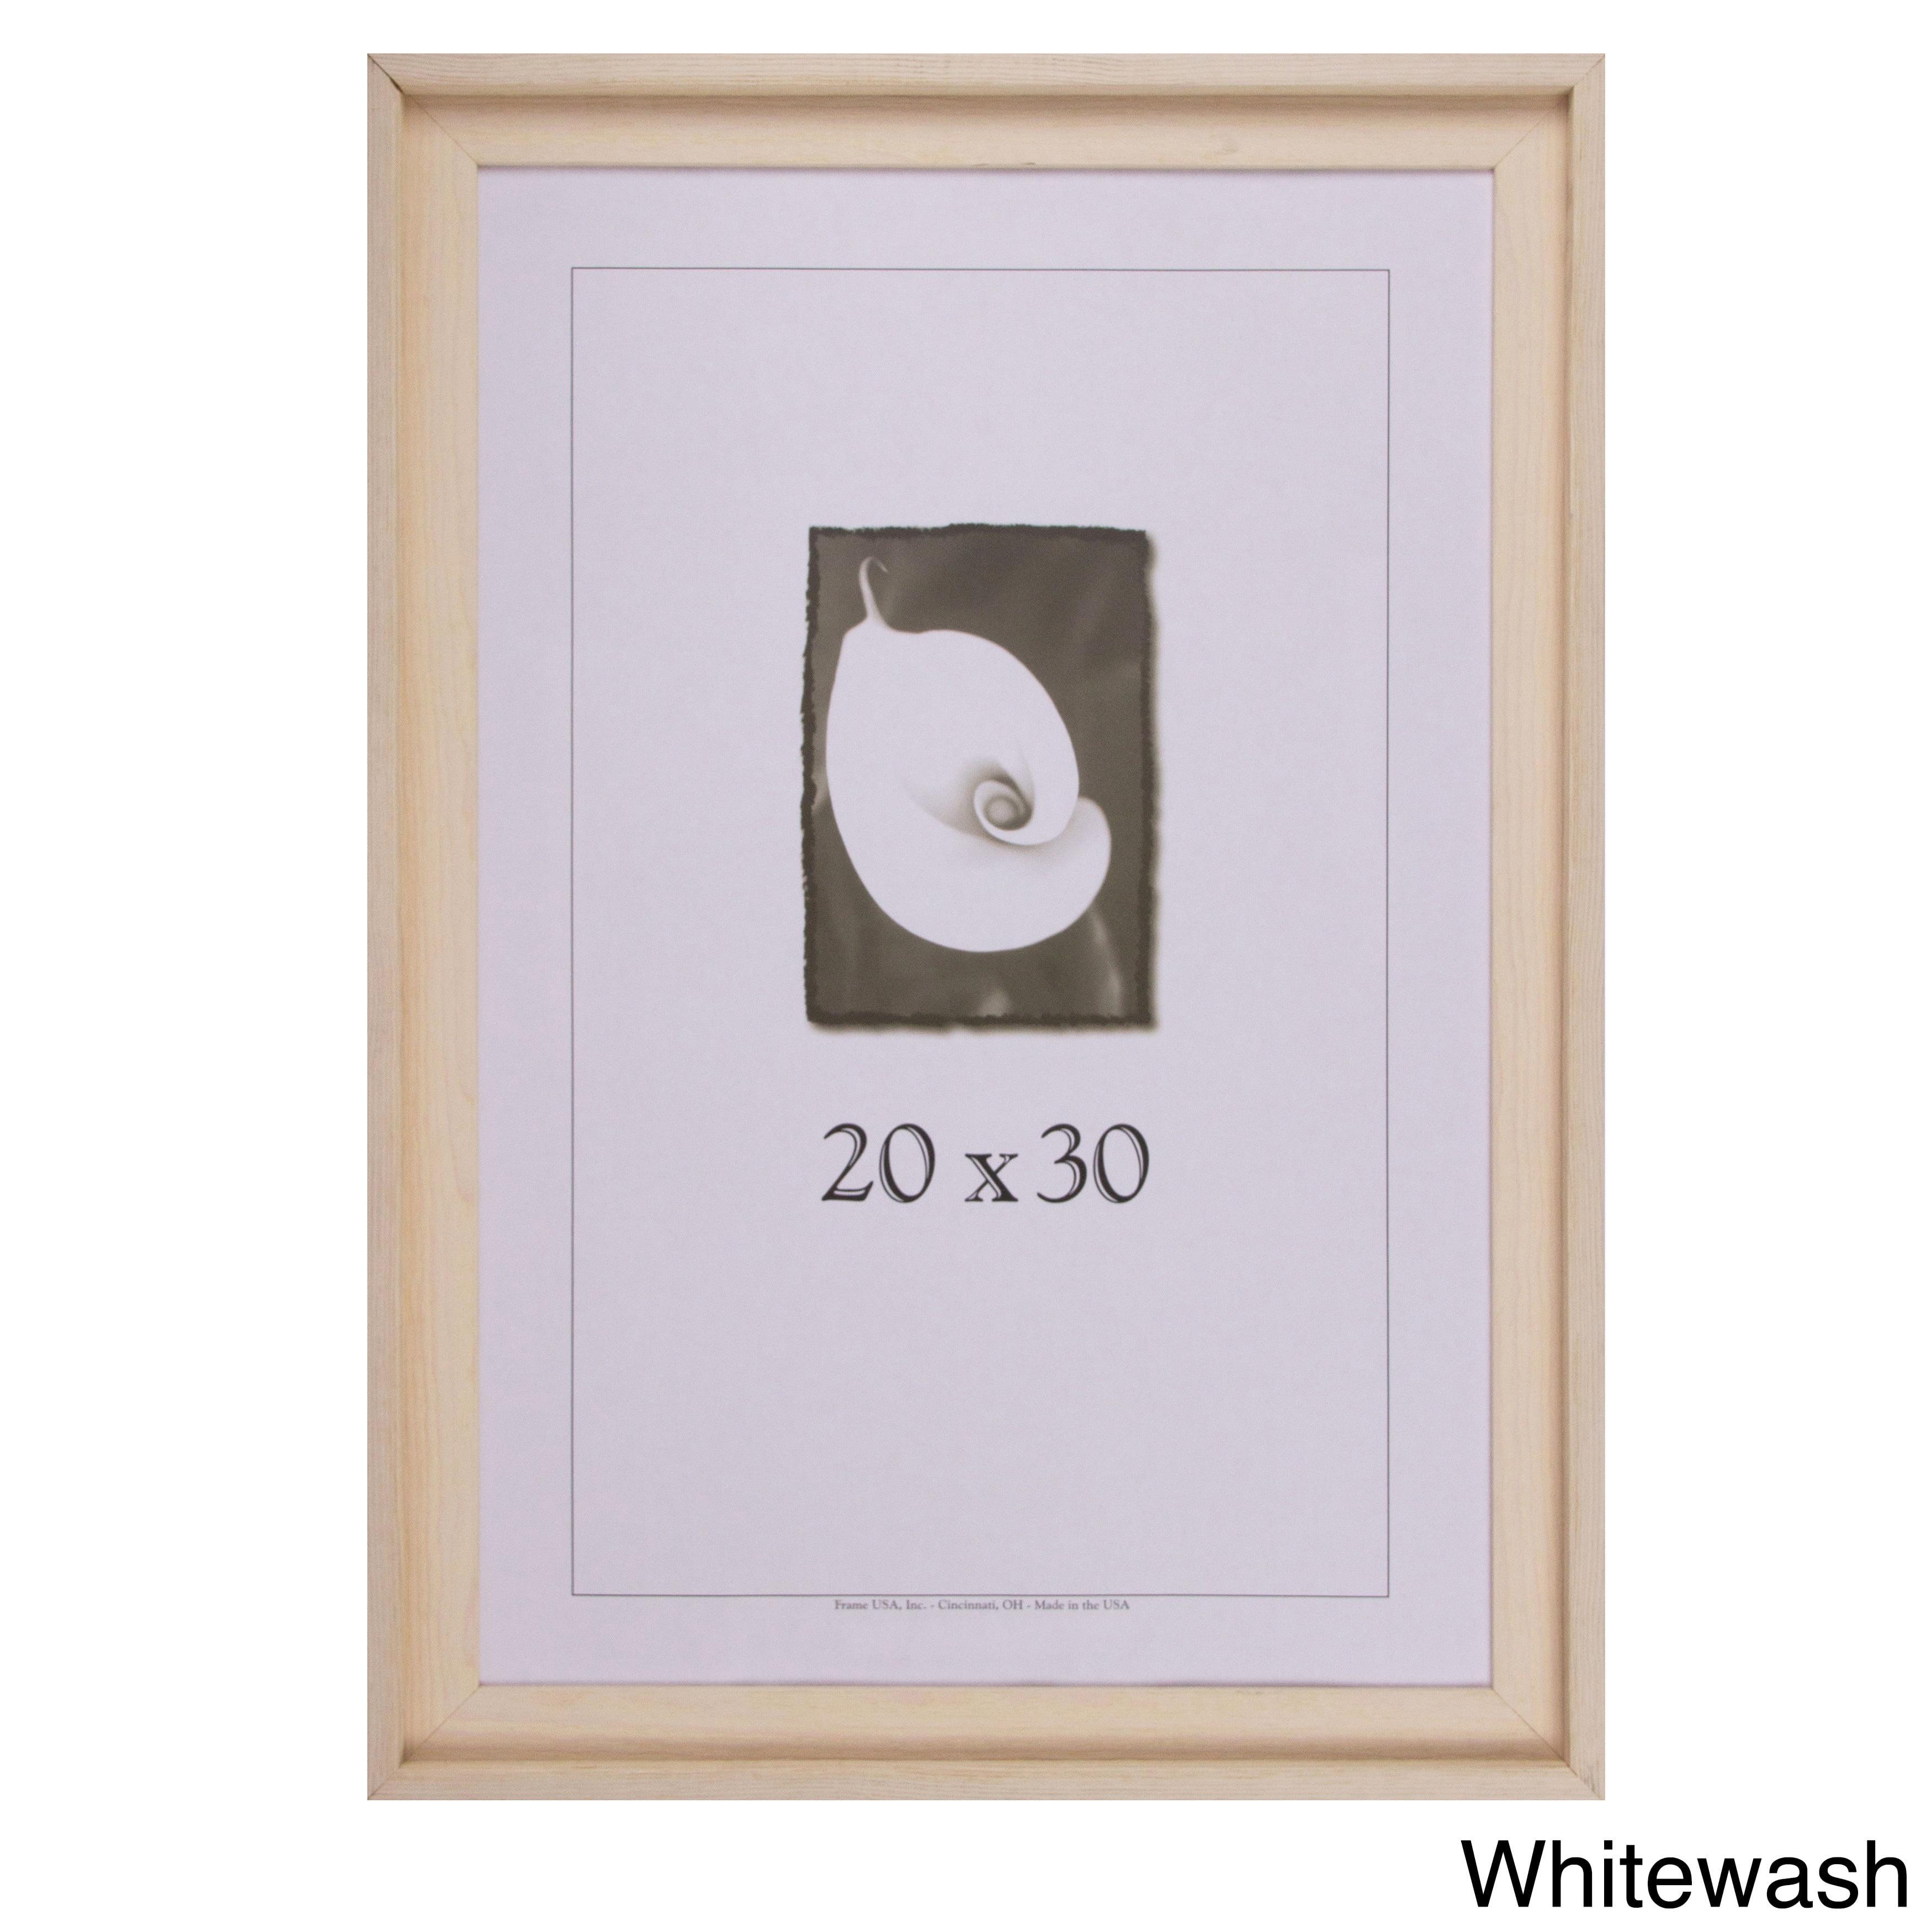 Colorful Walmart 20x30 Frame Image - Framed Art Ideas - roadofriches.com